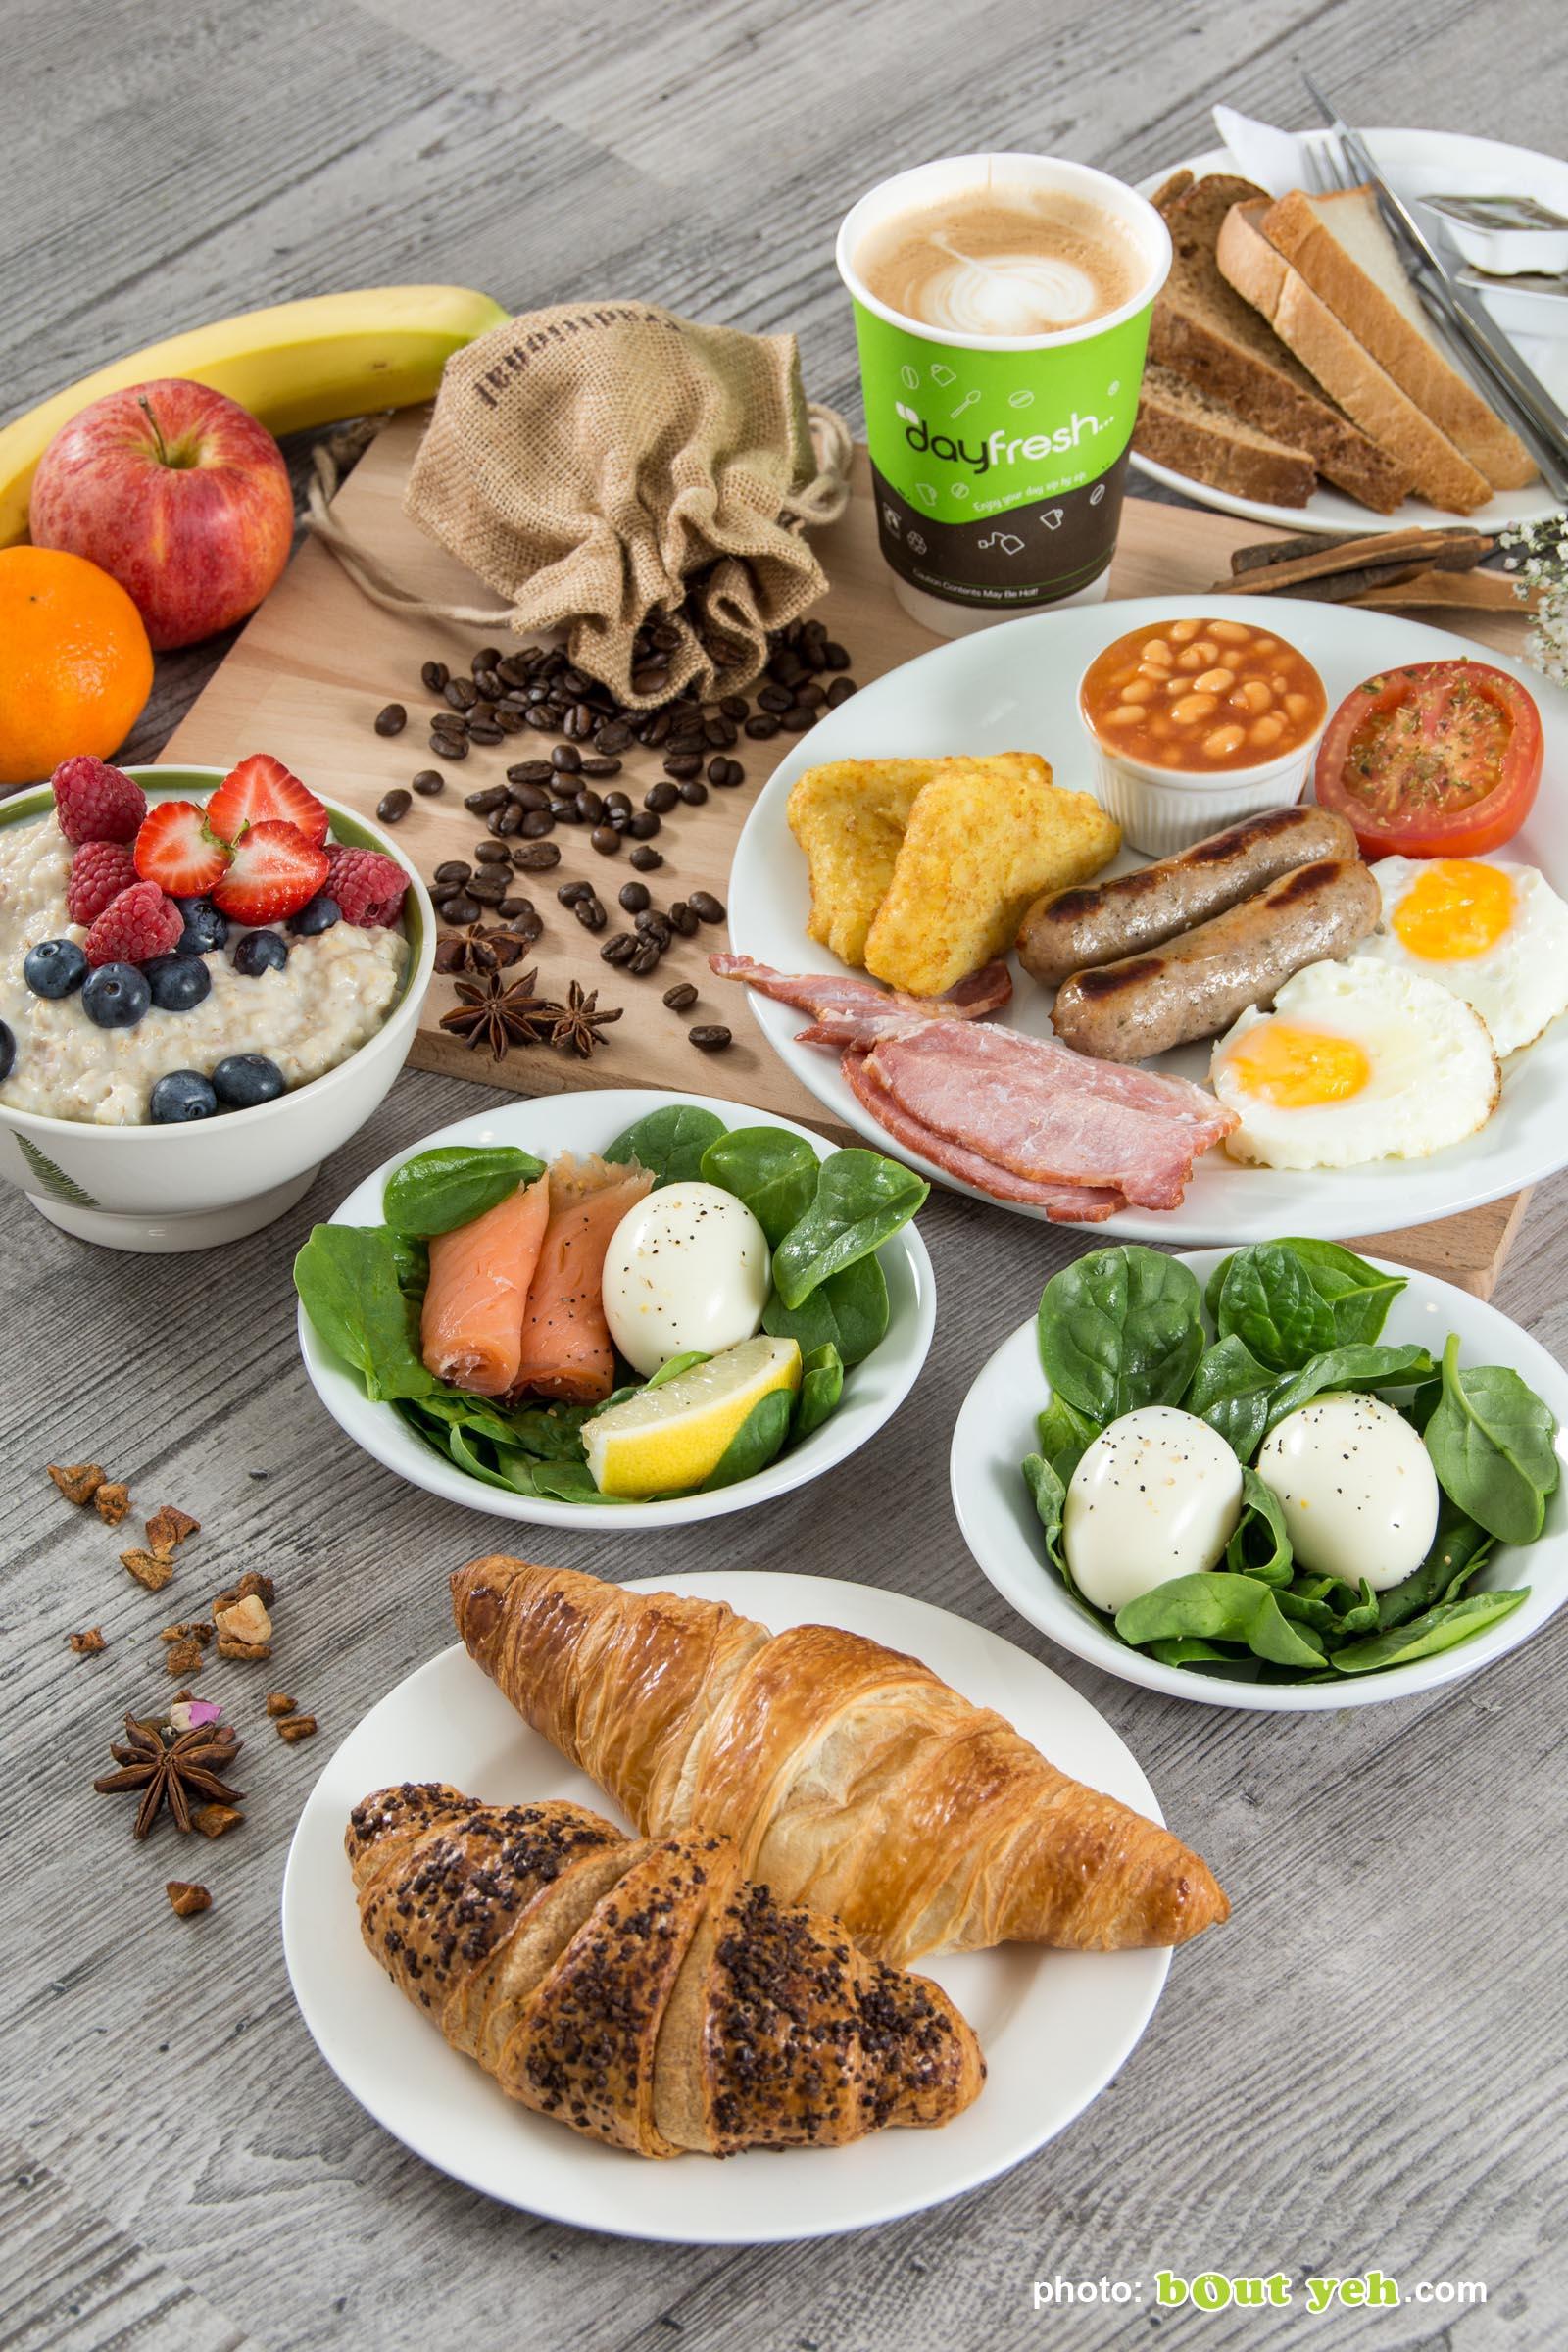 Food photographers Belfast portfolio photo 3708 - mixed breakfast with coffee